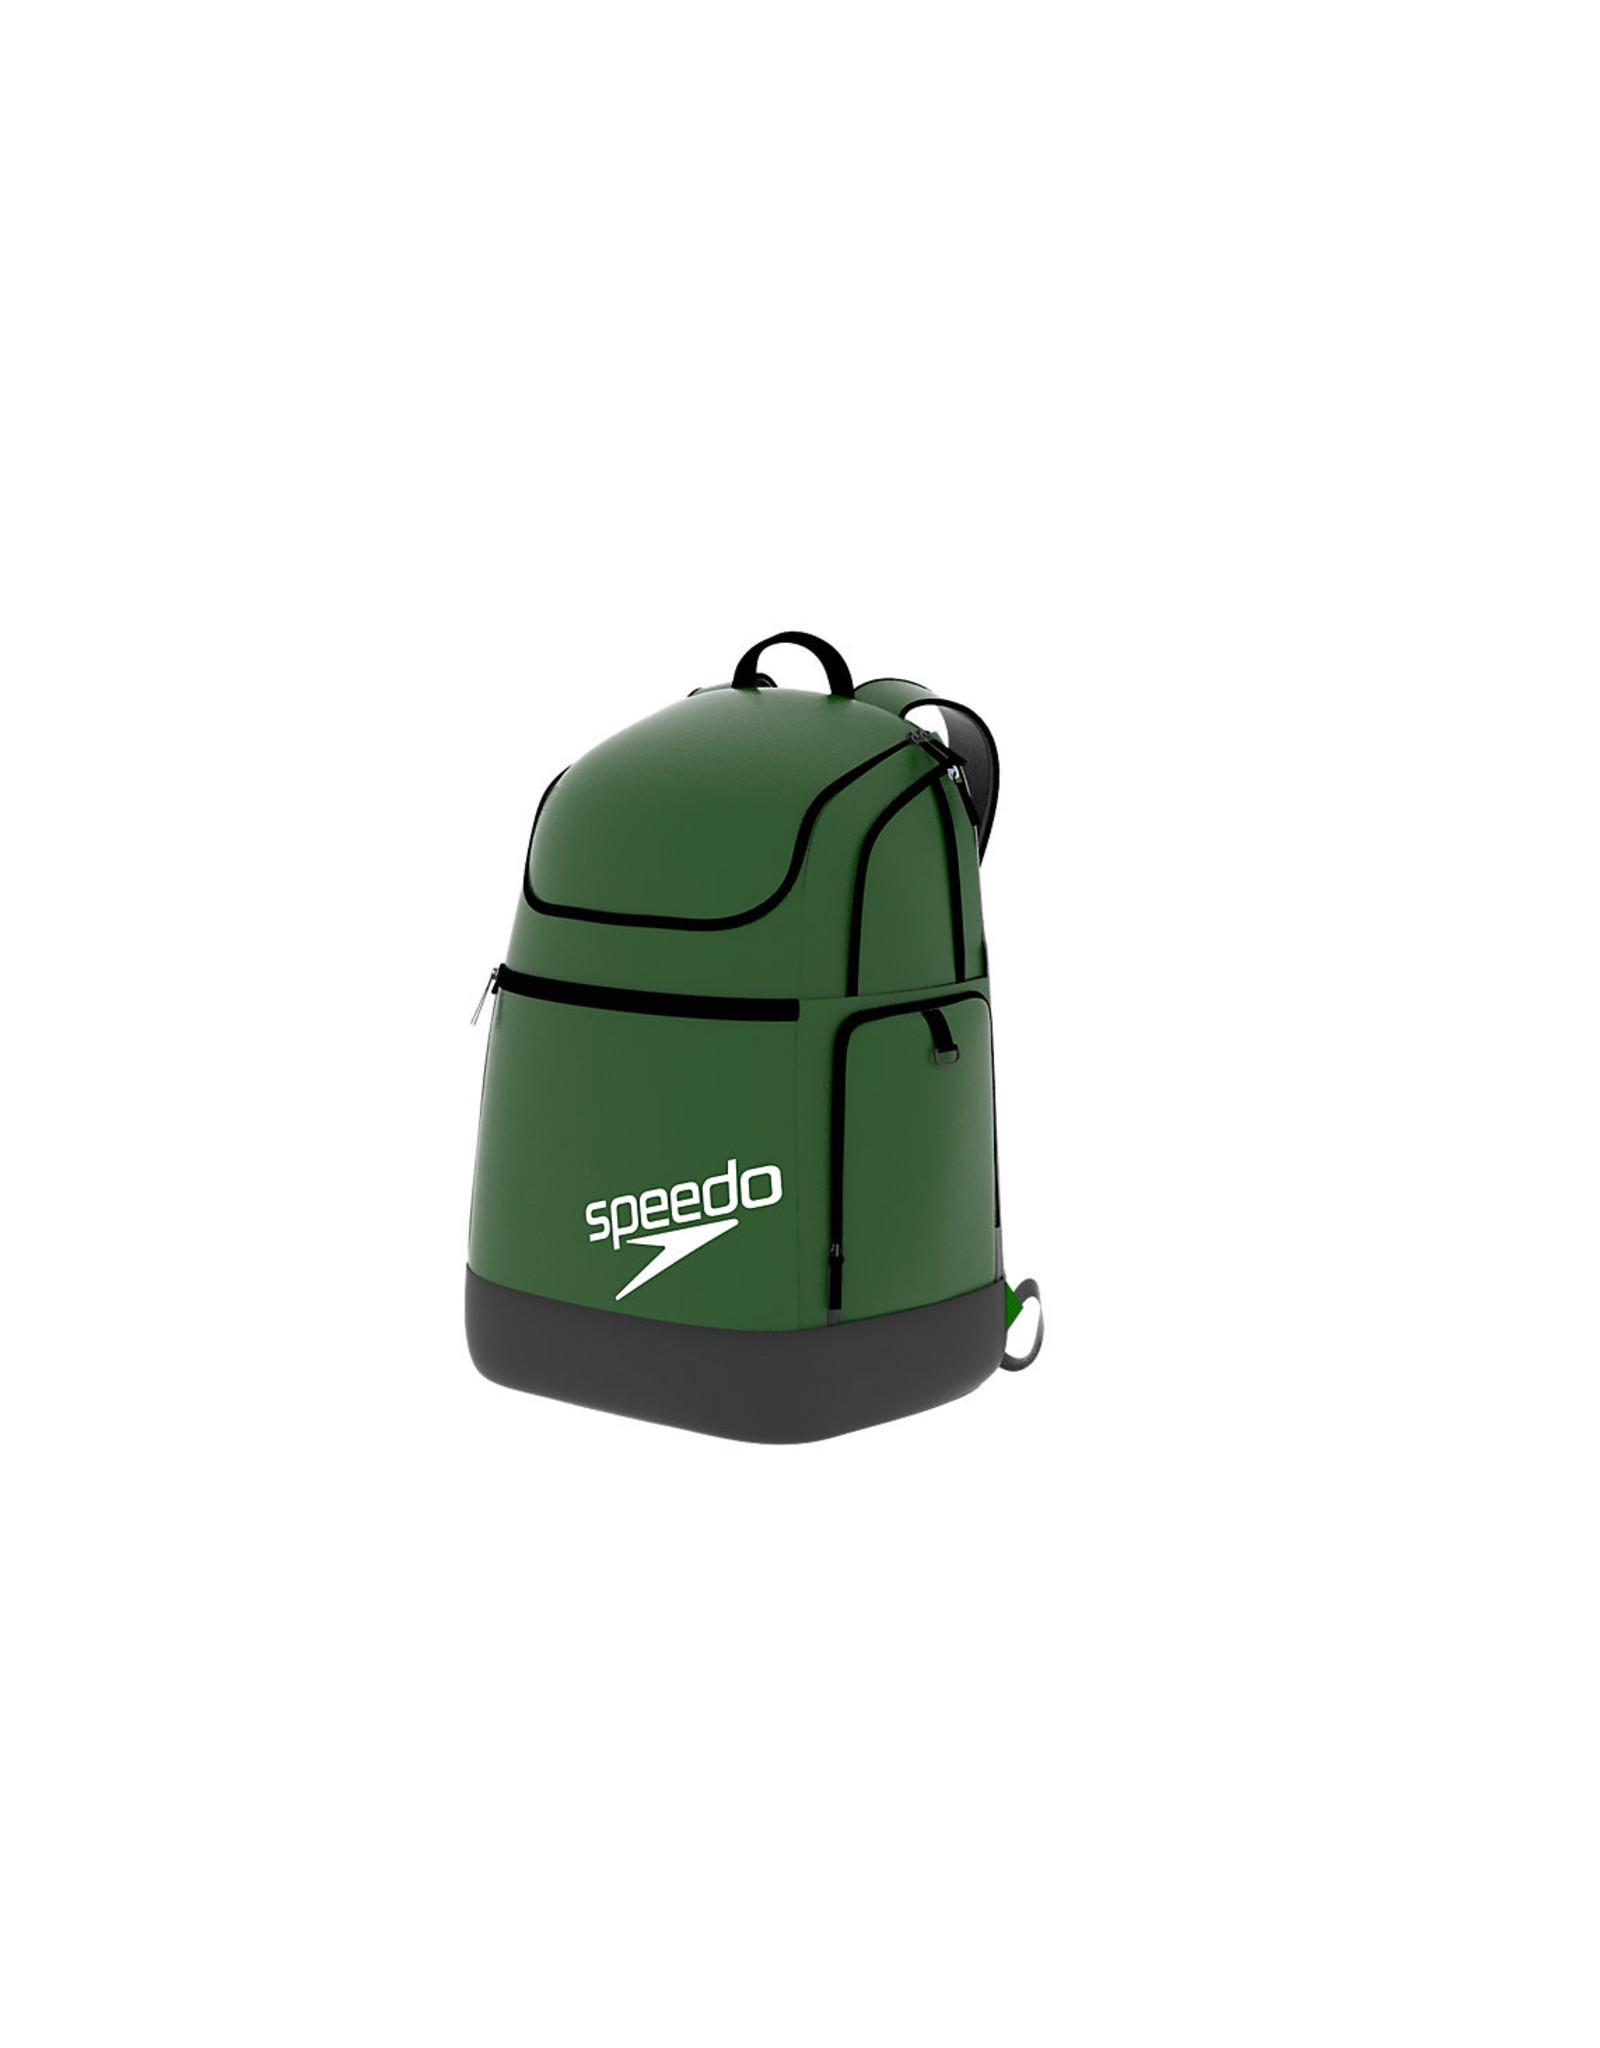 SPEEDO SPEEDO TEAMSTER BACKPACK 2.0 40L